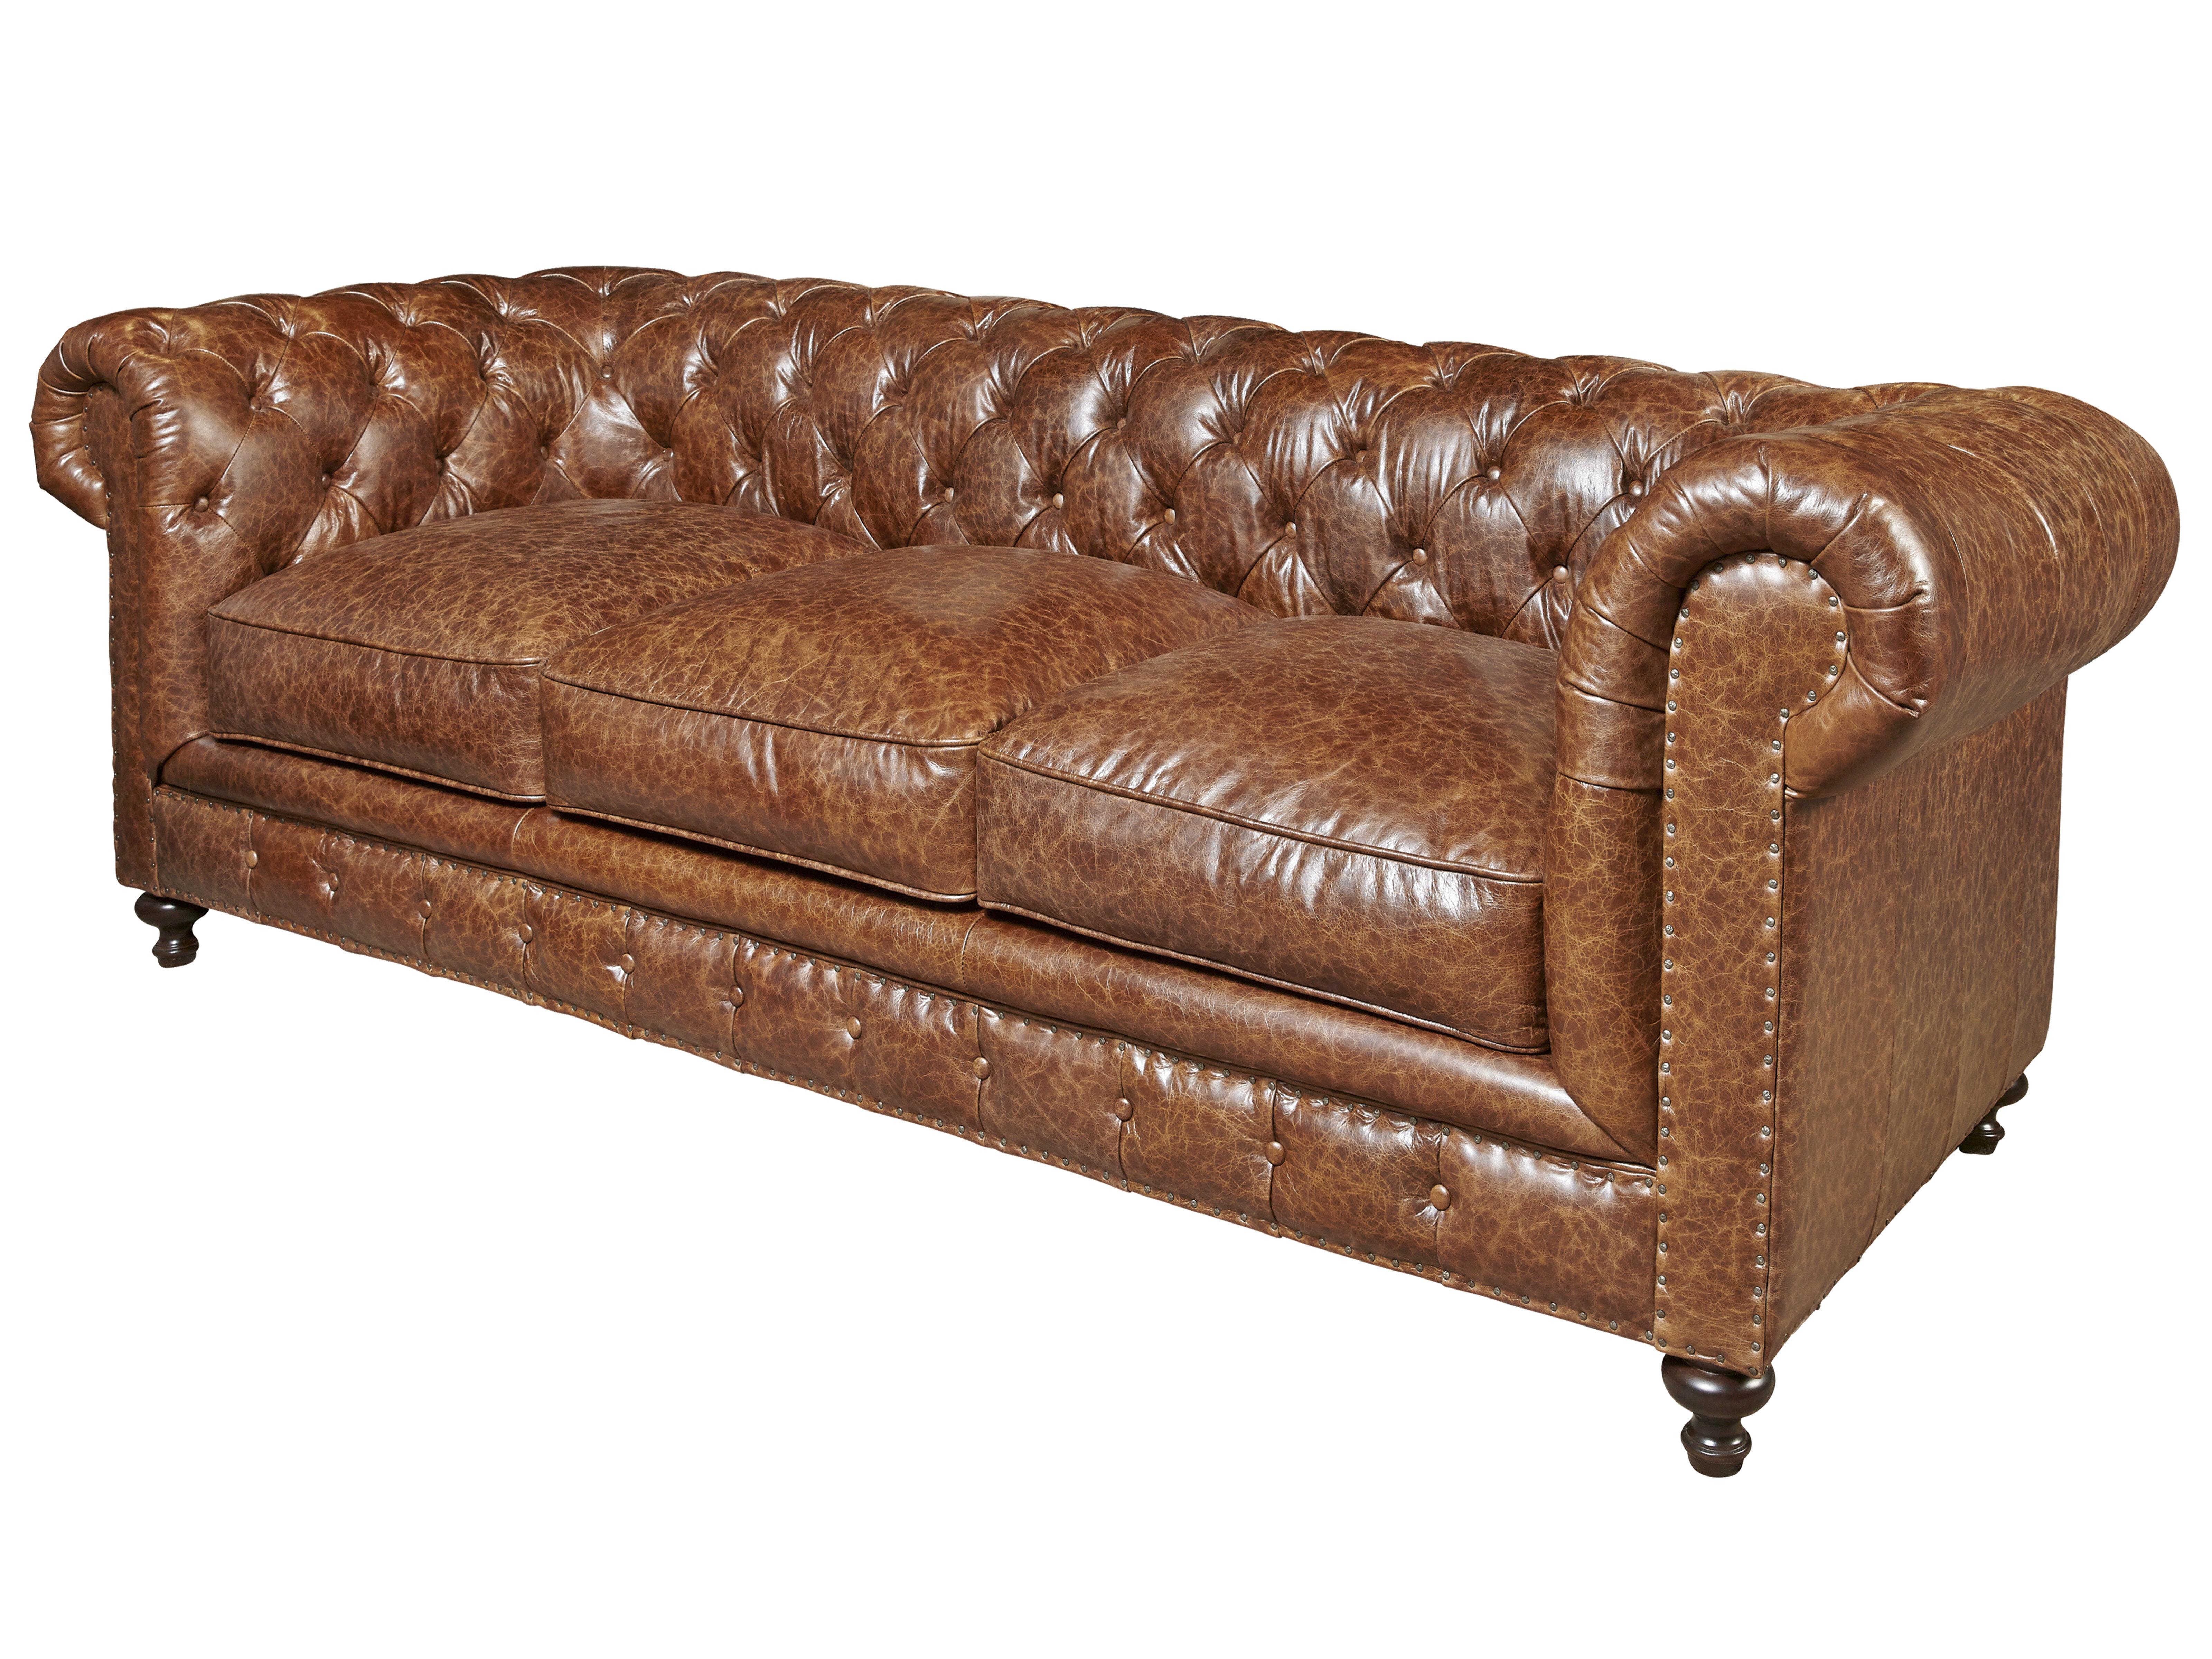 Charmant Trent Austin Design Julesburg Leather Chesterfield Sofa U0026 Reviews | Wayfair